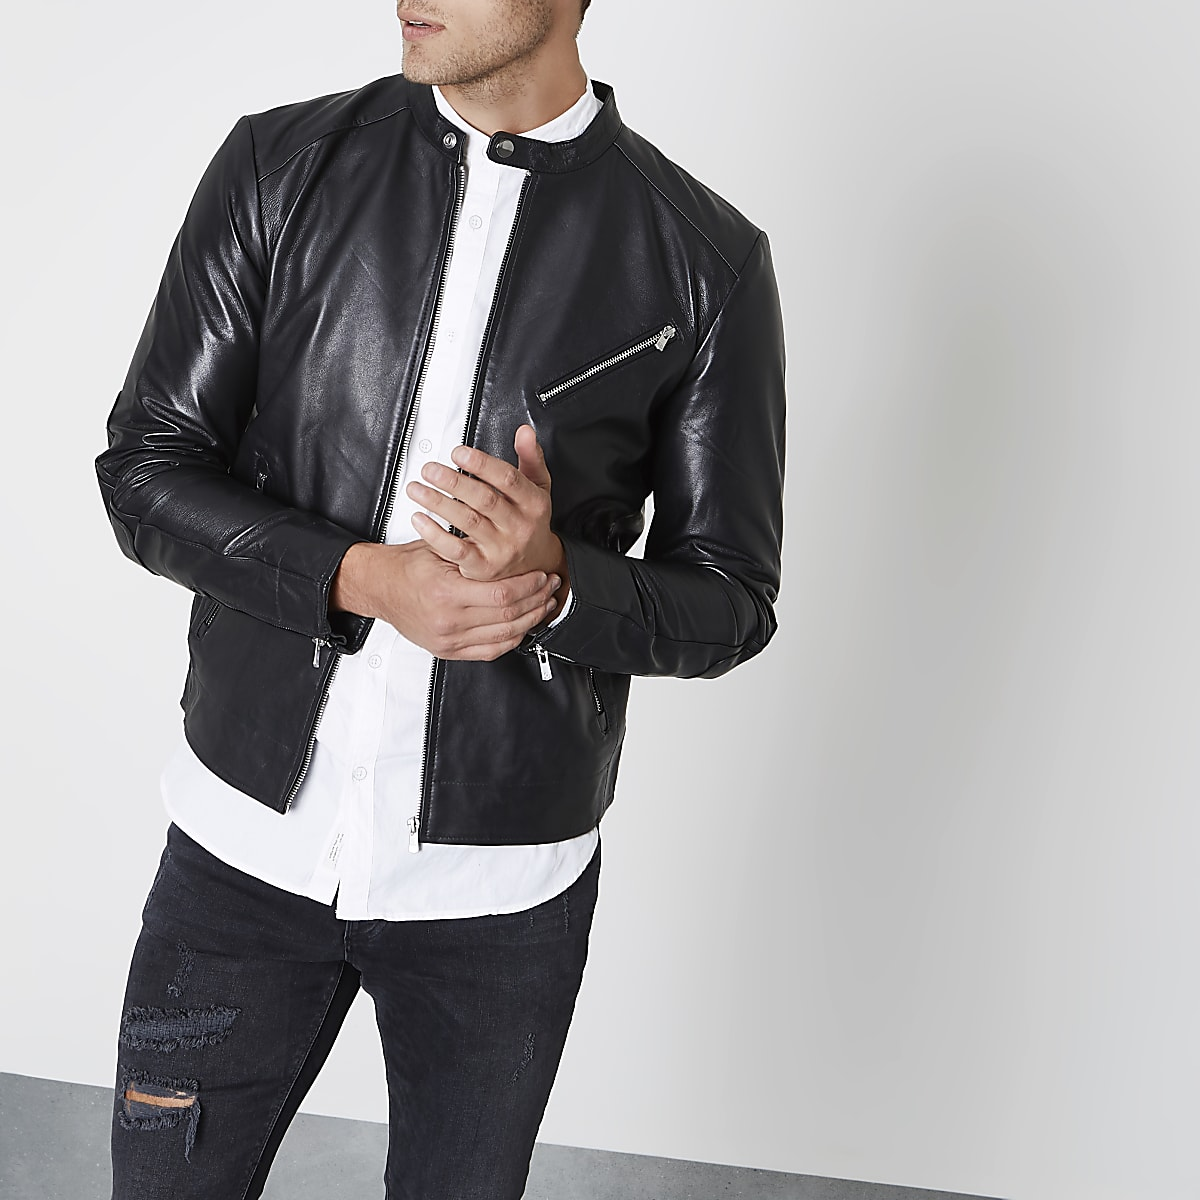 a18d1f35d03540 Black Jack   Jones Premium leather jacket - Jackets - Coats   Jackets - men